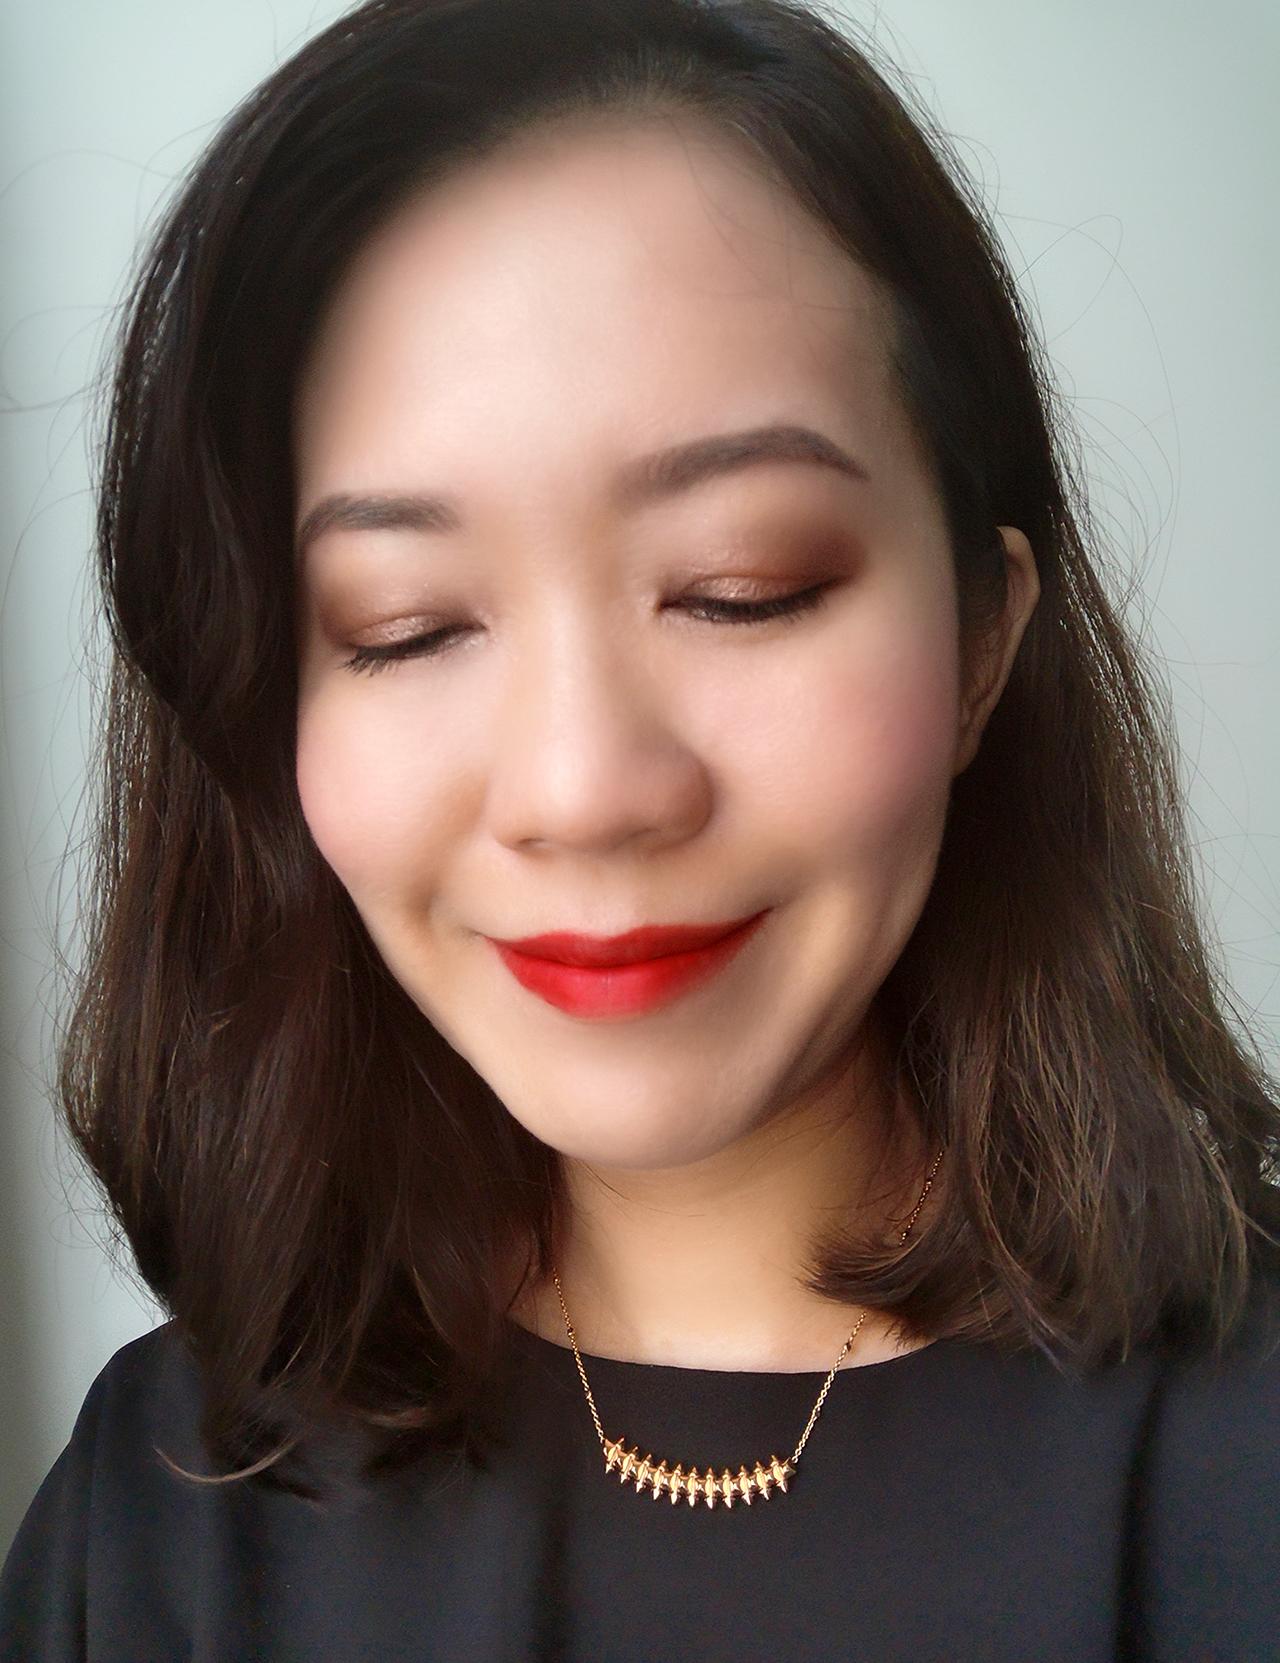 Maison Kitsune x Shu uemura camo eyeshadow palette, Rouge Unlimited Supreme Matte RD163